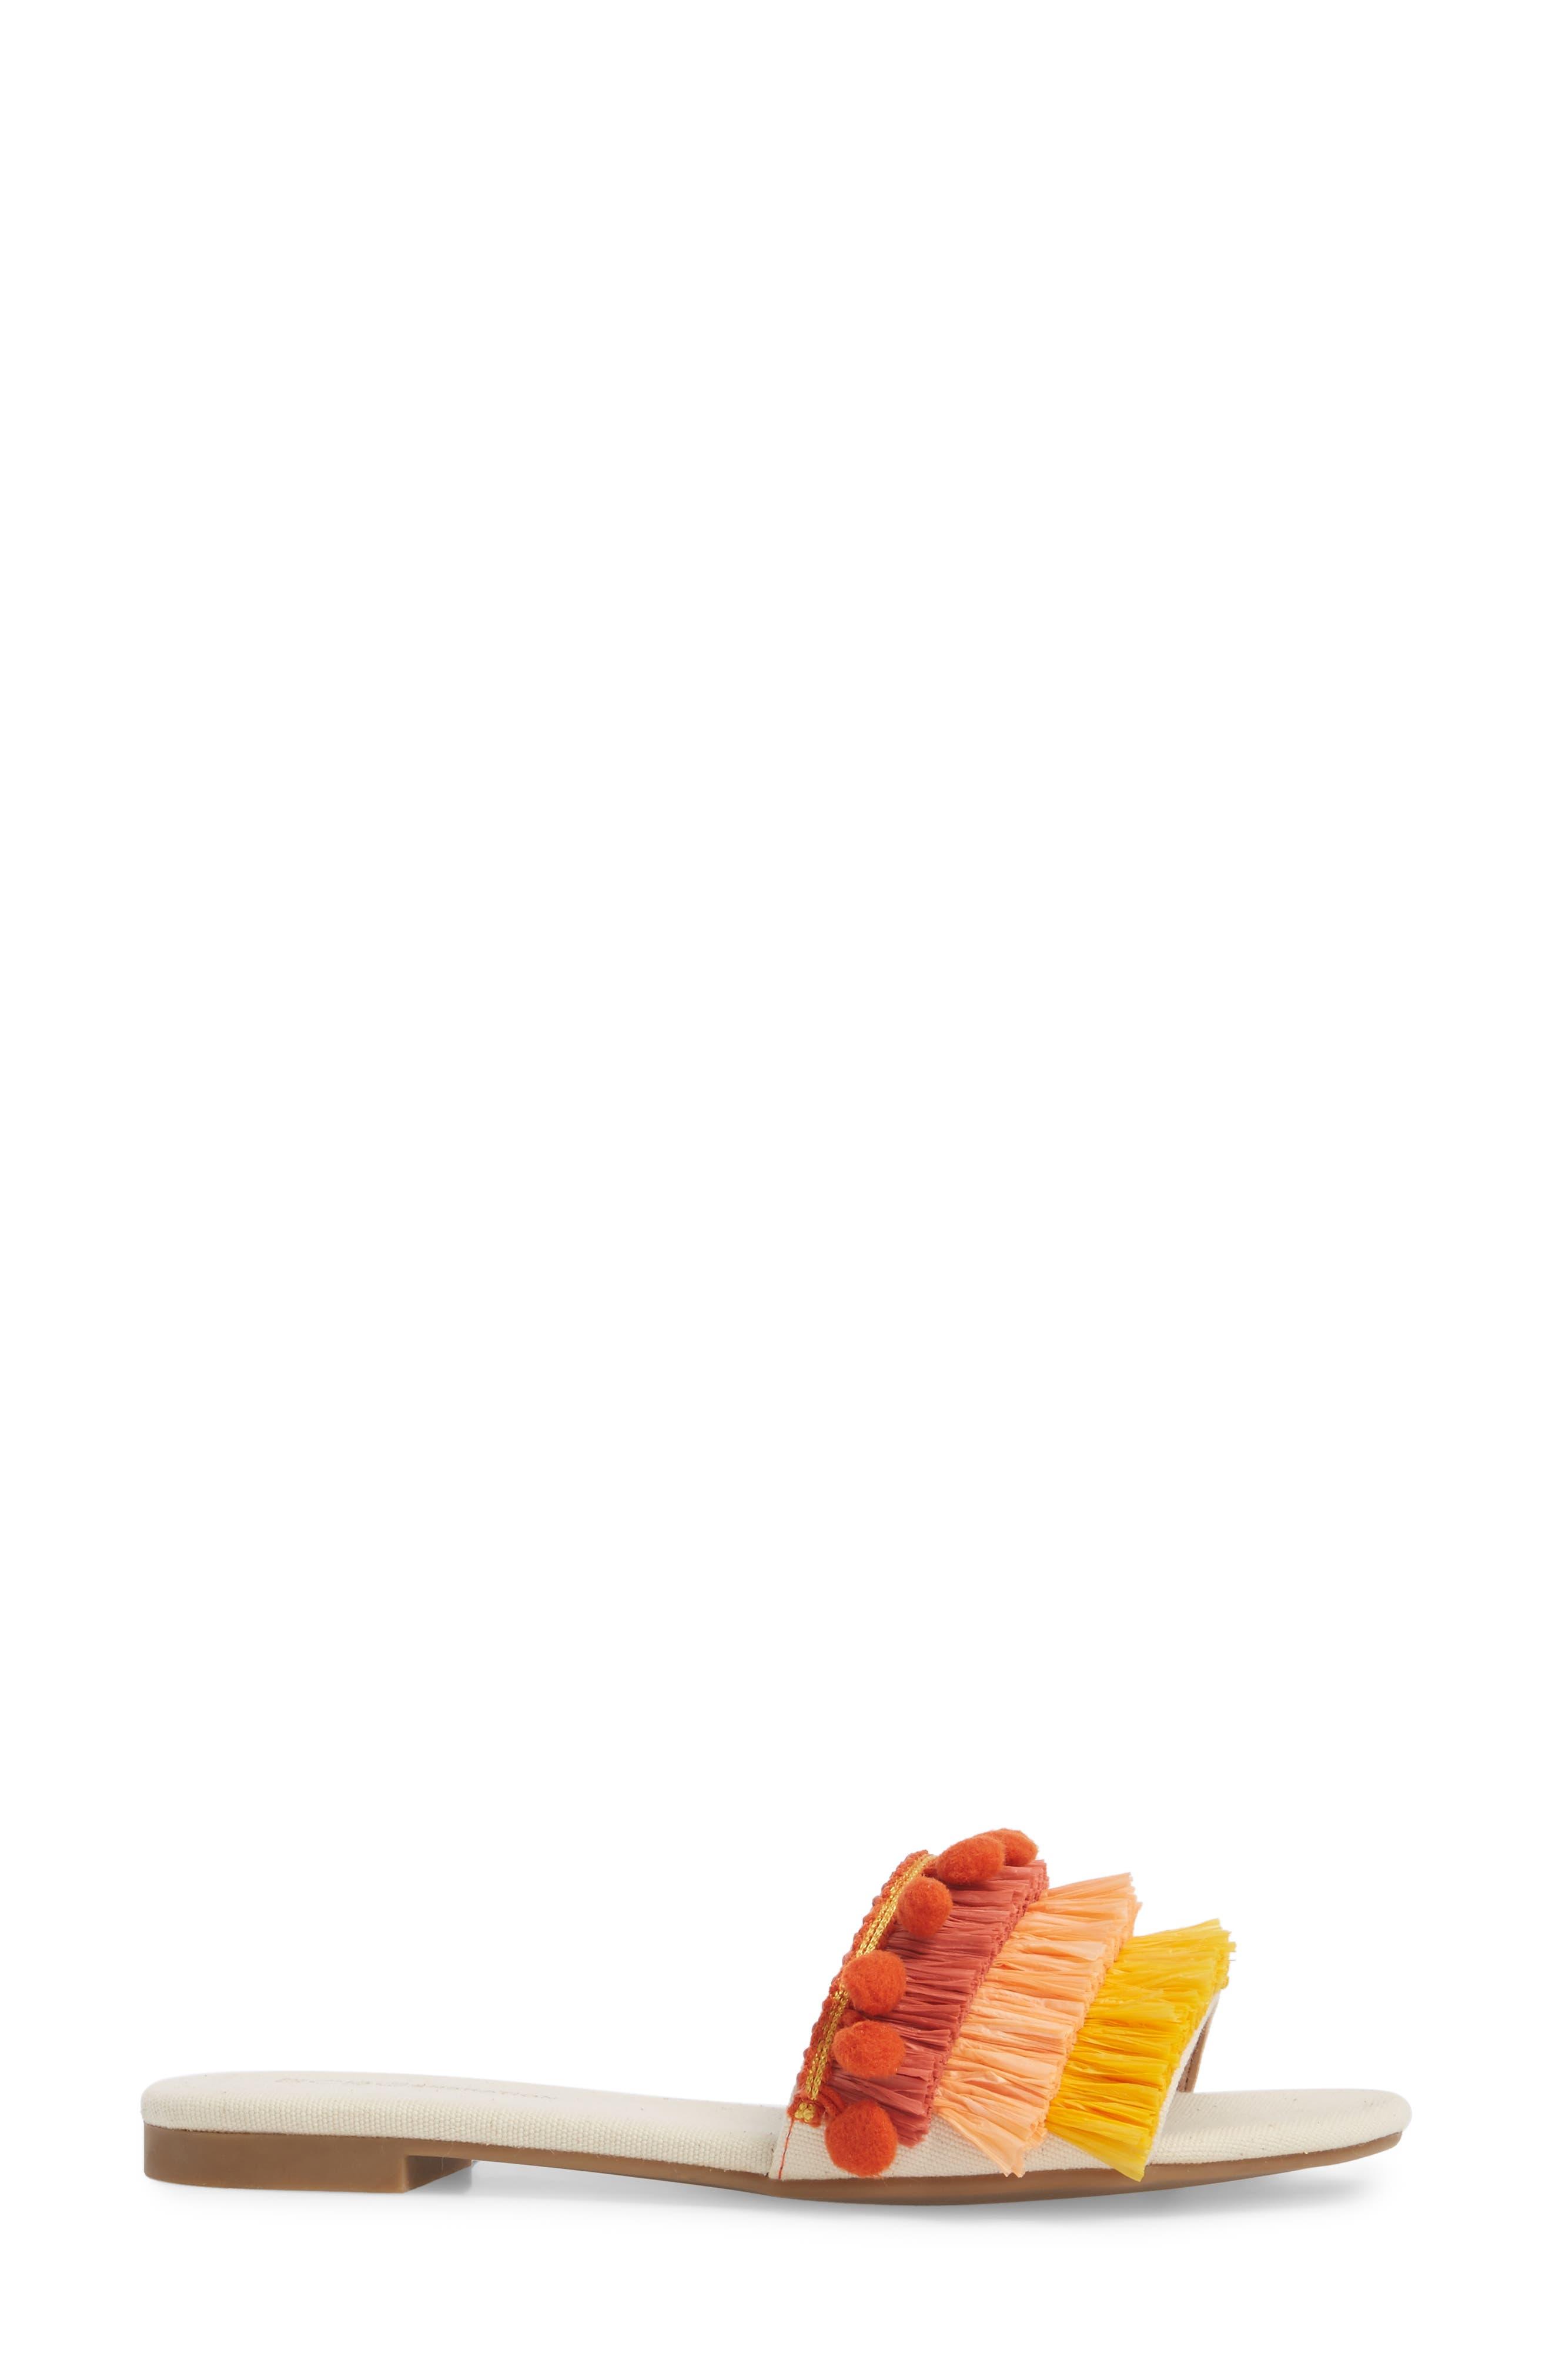 Genna Raffia Tier Slide Sandal,                             Alternate thumbnail 3, color,                             Marigold/ Rust